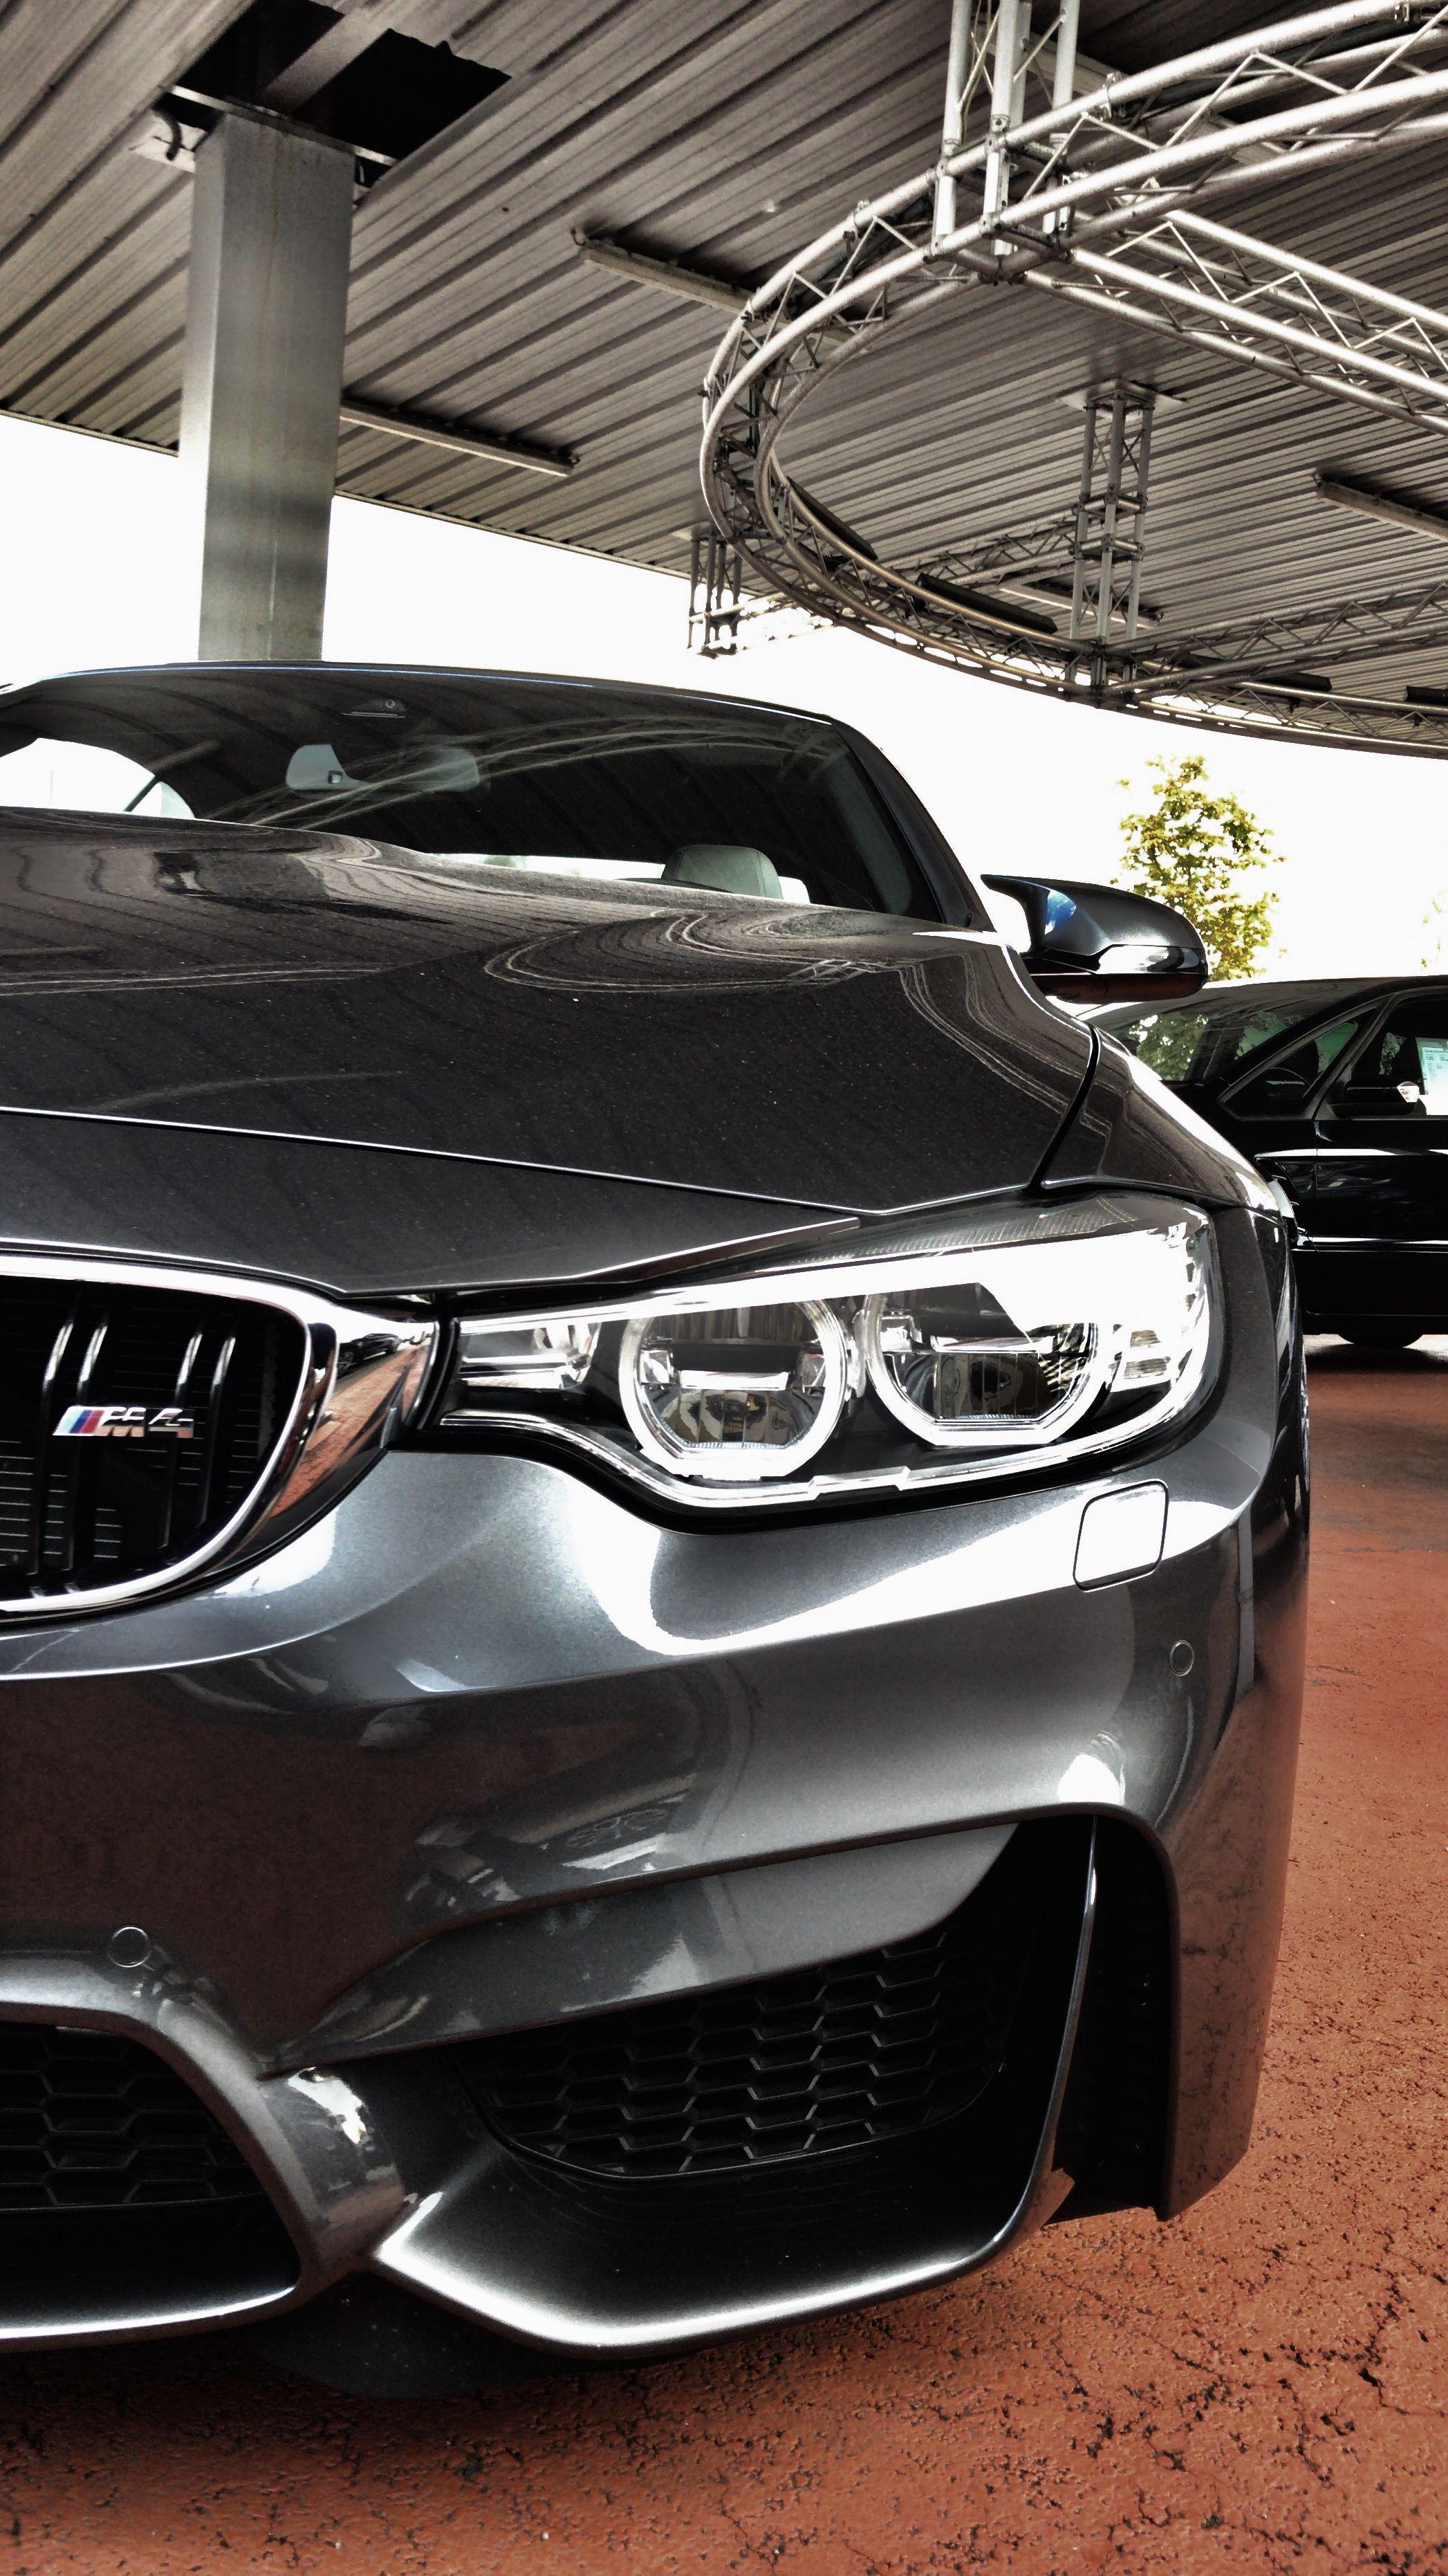 BMW M4 F83 F82 Grey Metallic iPhone 7 Wallpaper Bmw, Bmw